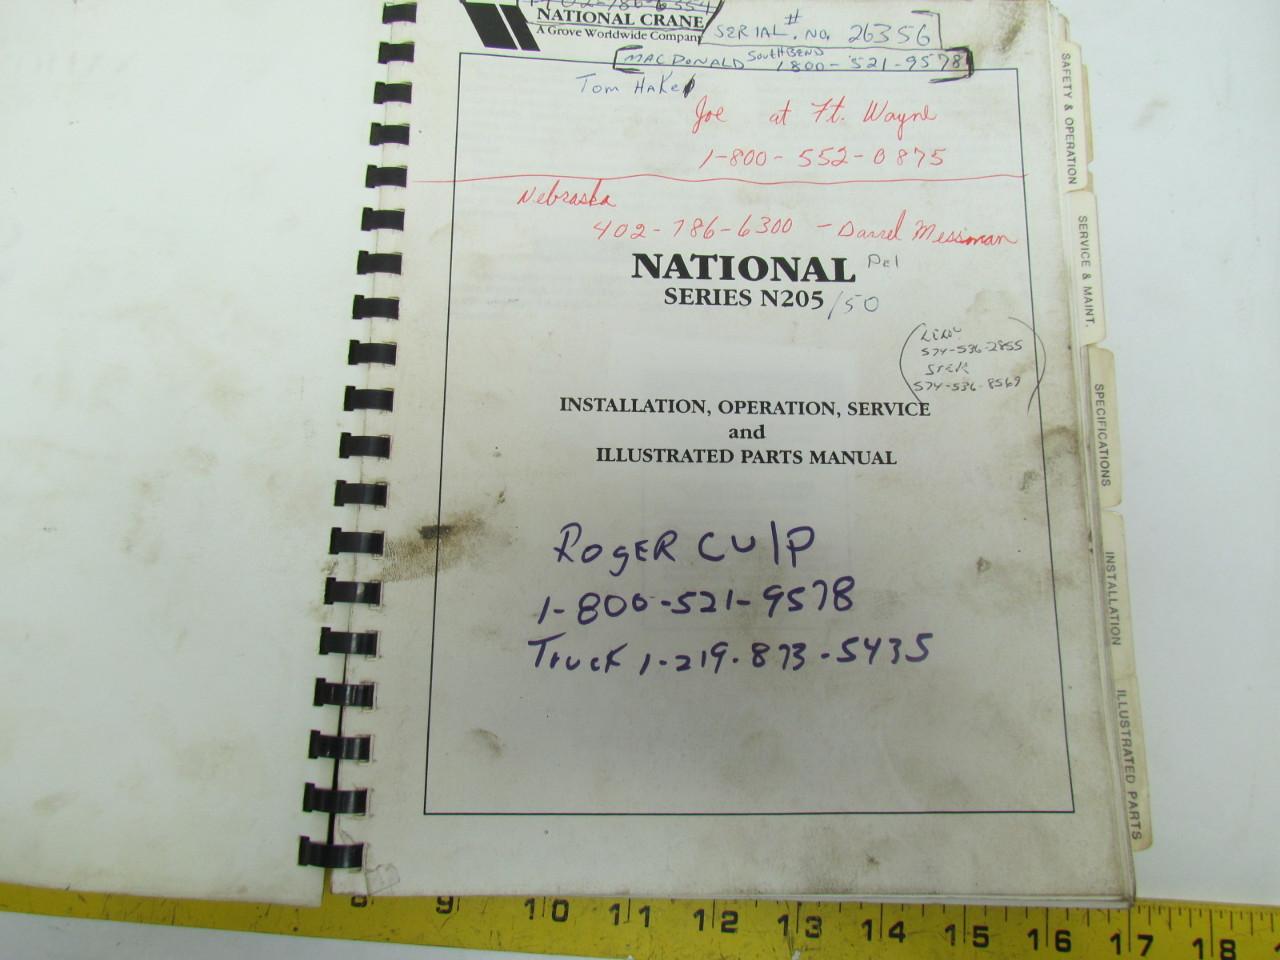 National crane owners Manual 1800